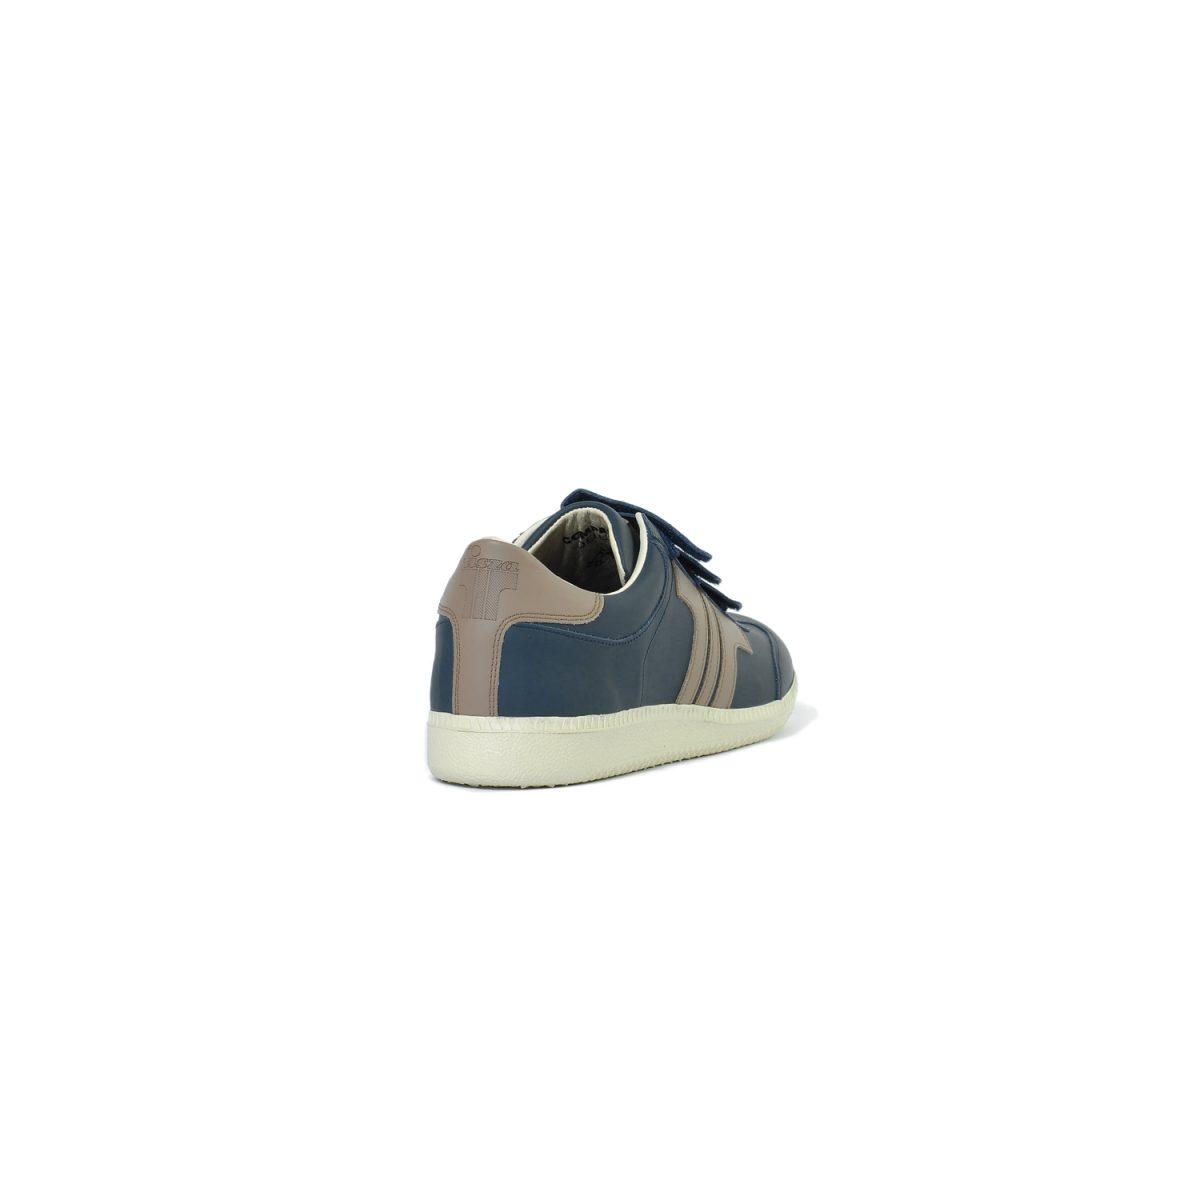 Tisza shoes - Compakt delux - Navy-pigeon